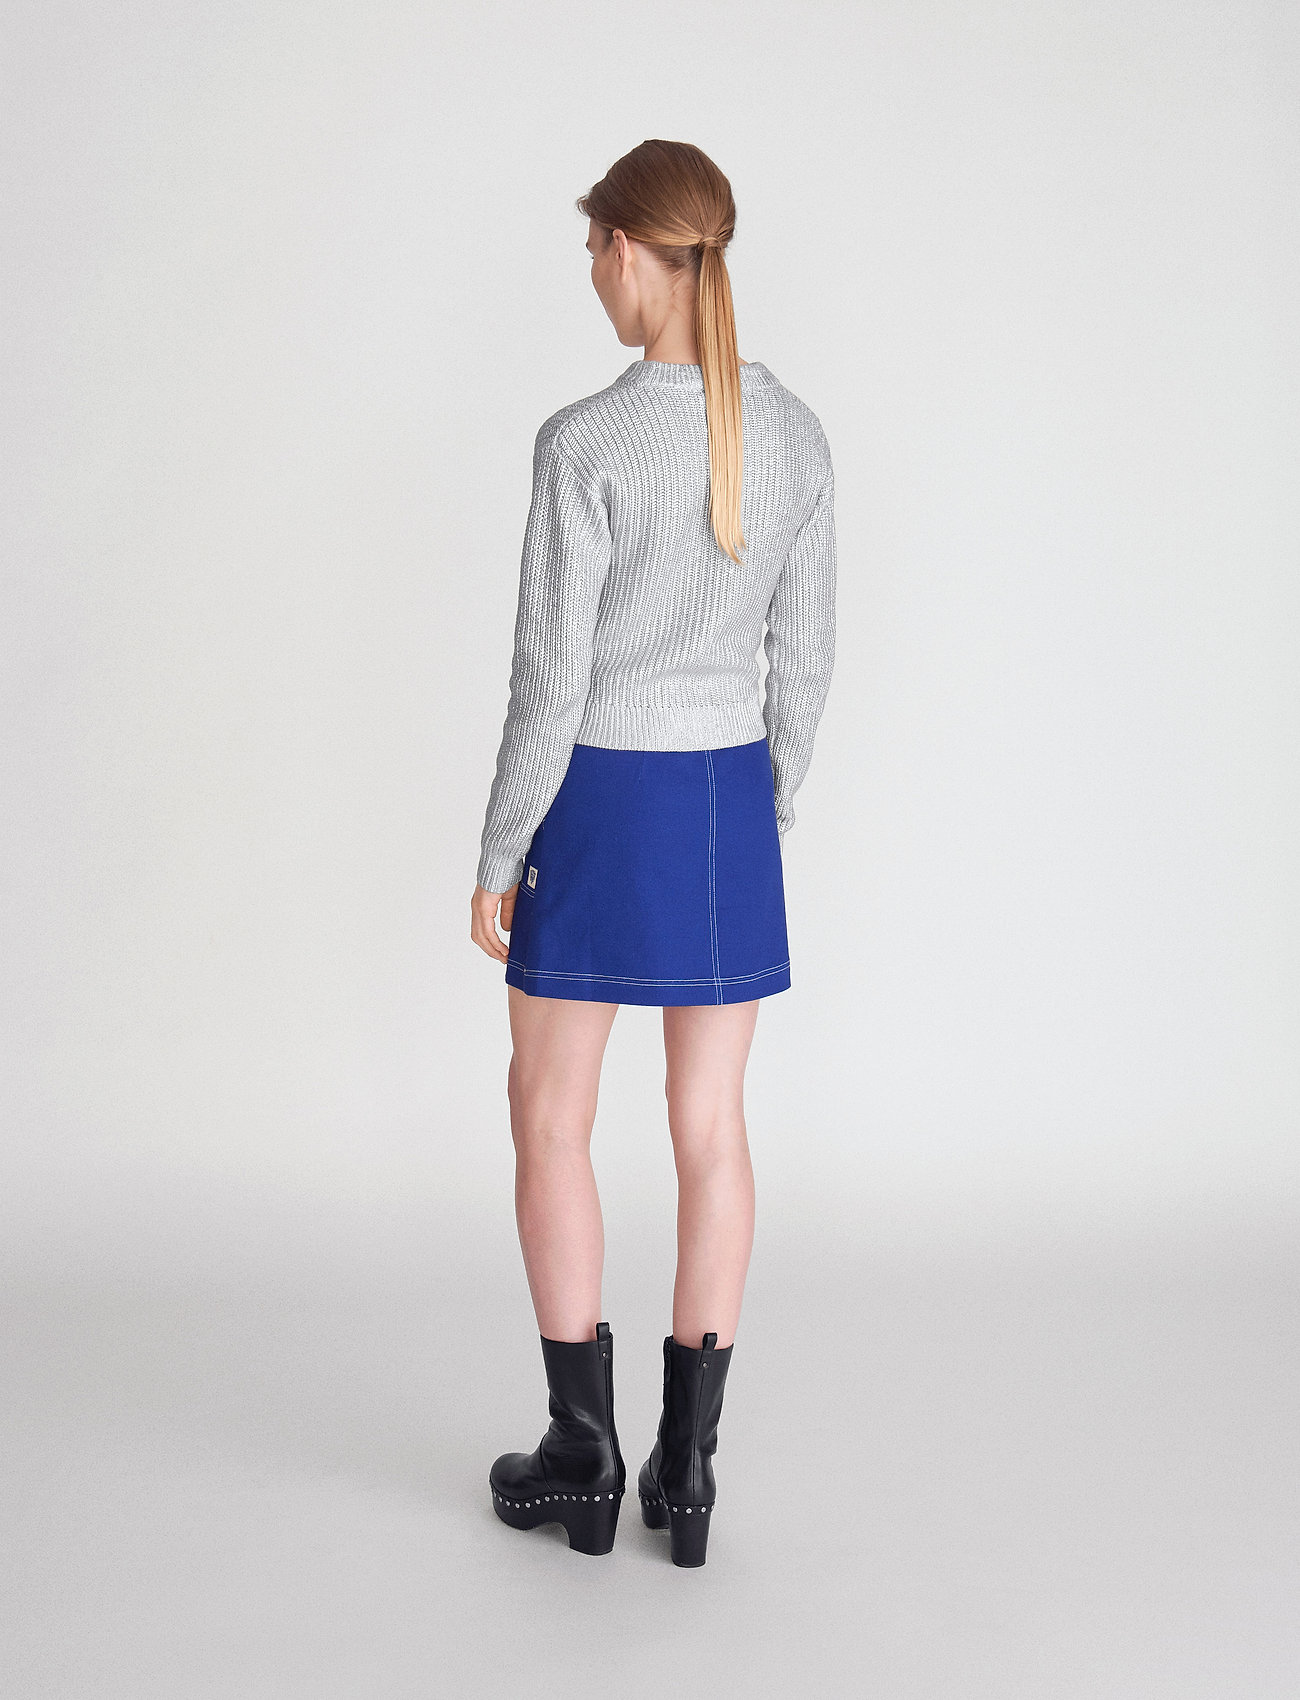 Rosasiamercury Of Rosasiamercury Jeans GreyTiger Of Sweden GreyTiger SVUzMp